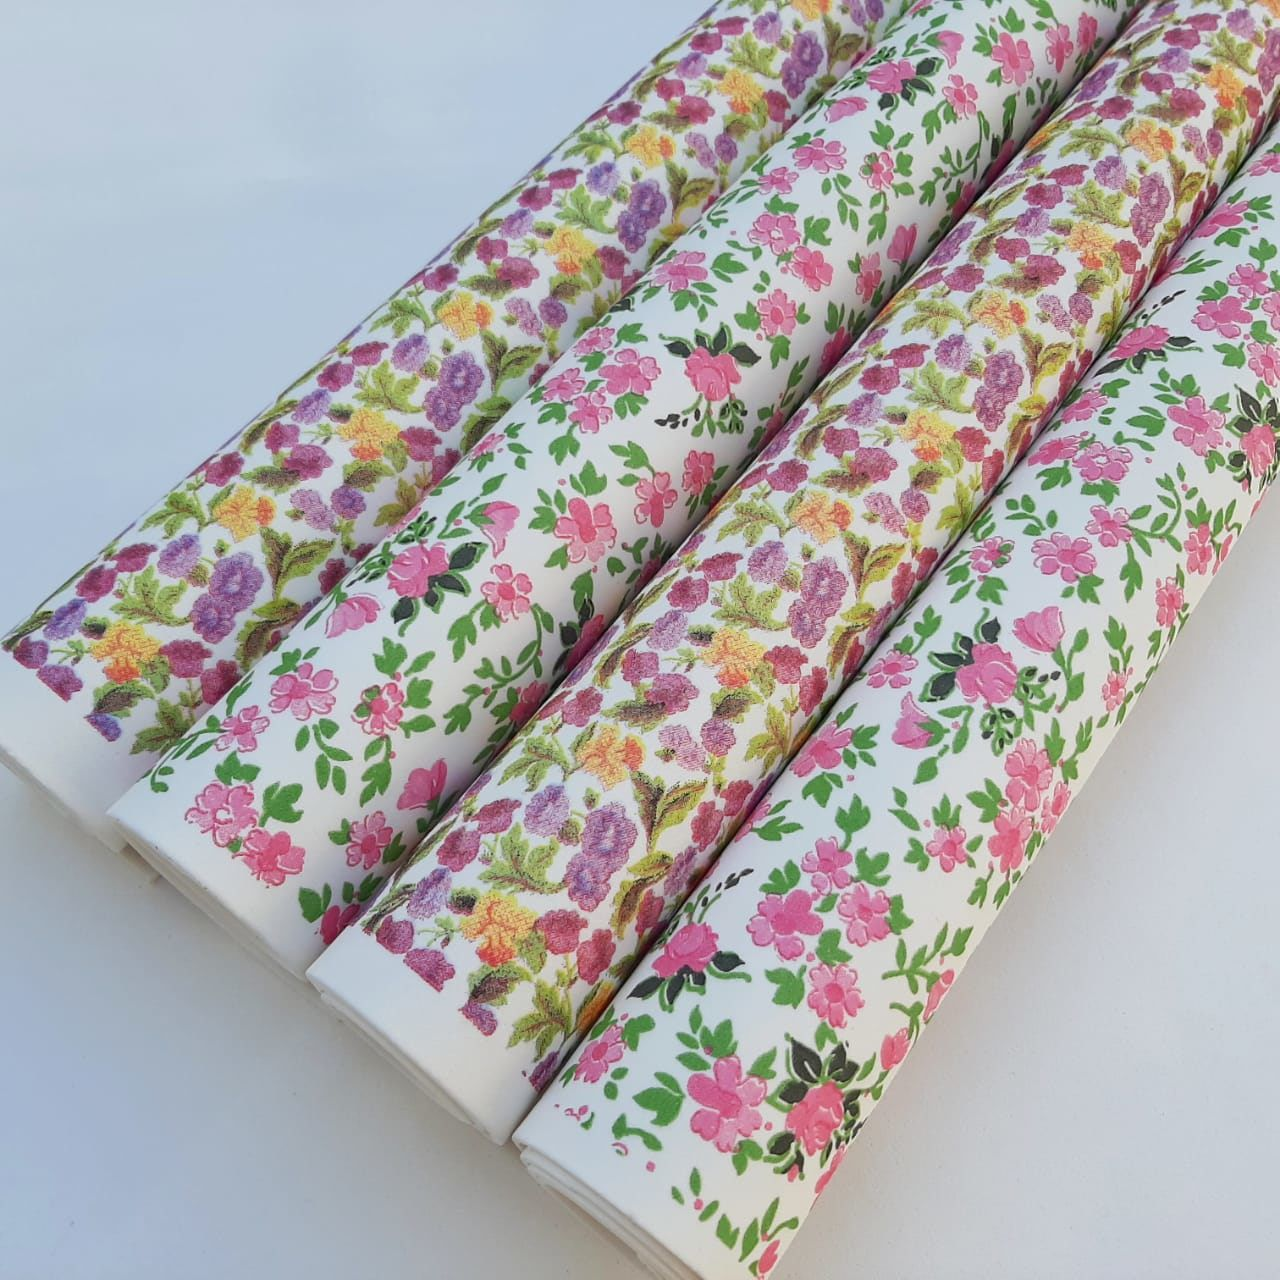 Folha de Eva Estampado Floral Premium